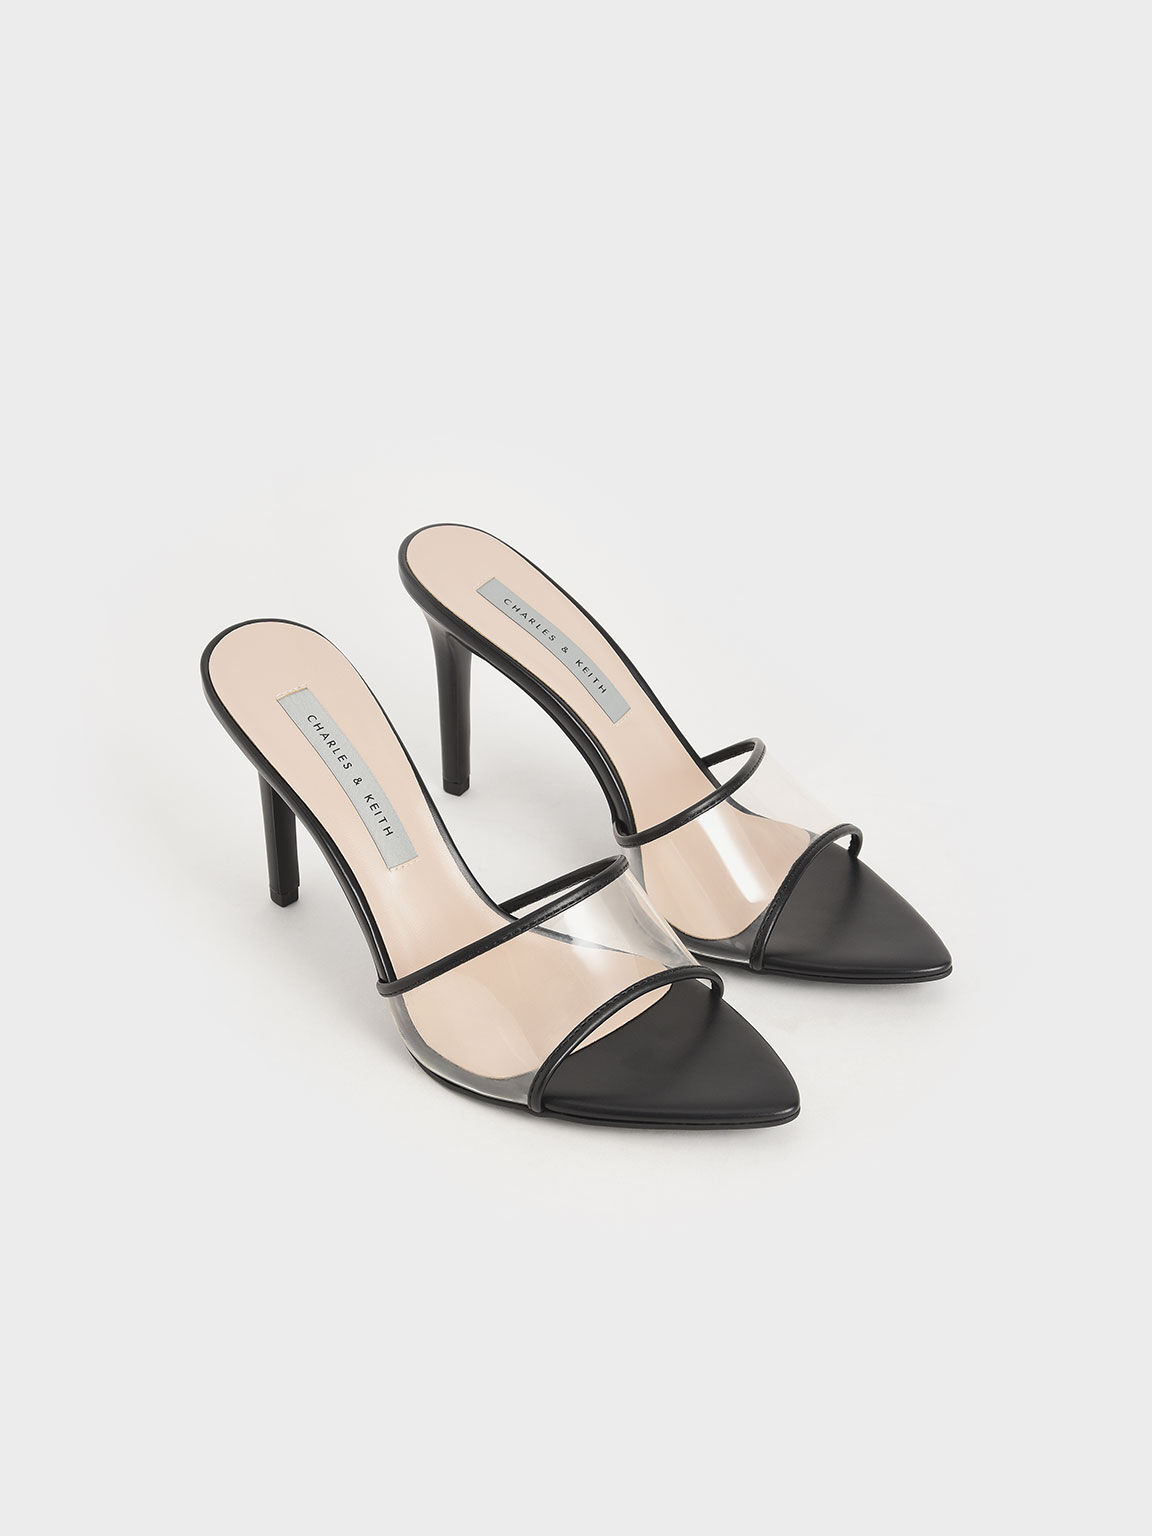 Sandal Mules Clear Strap, Black, hi-res